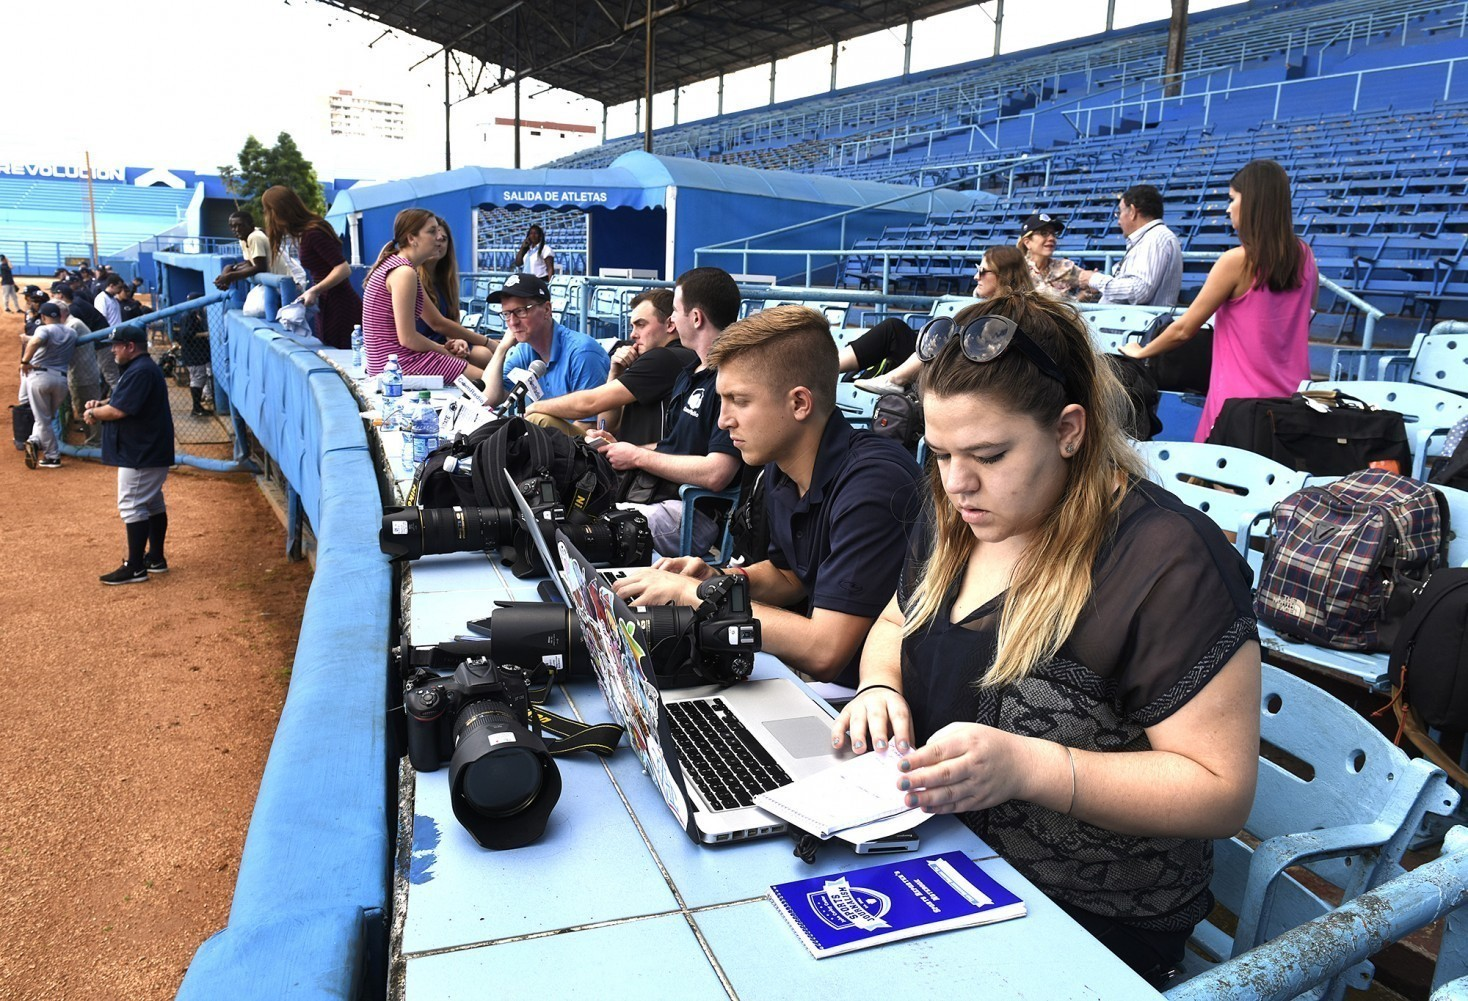 Students at work in Cuban press box